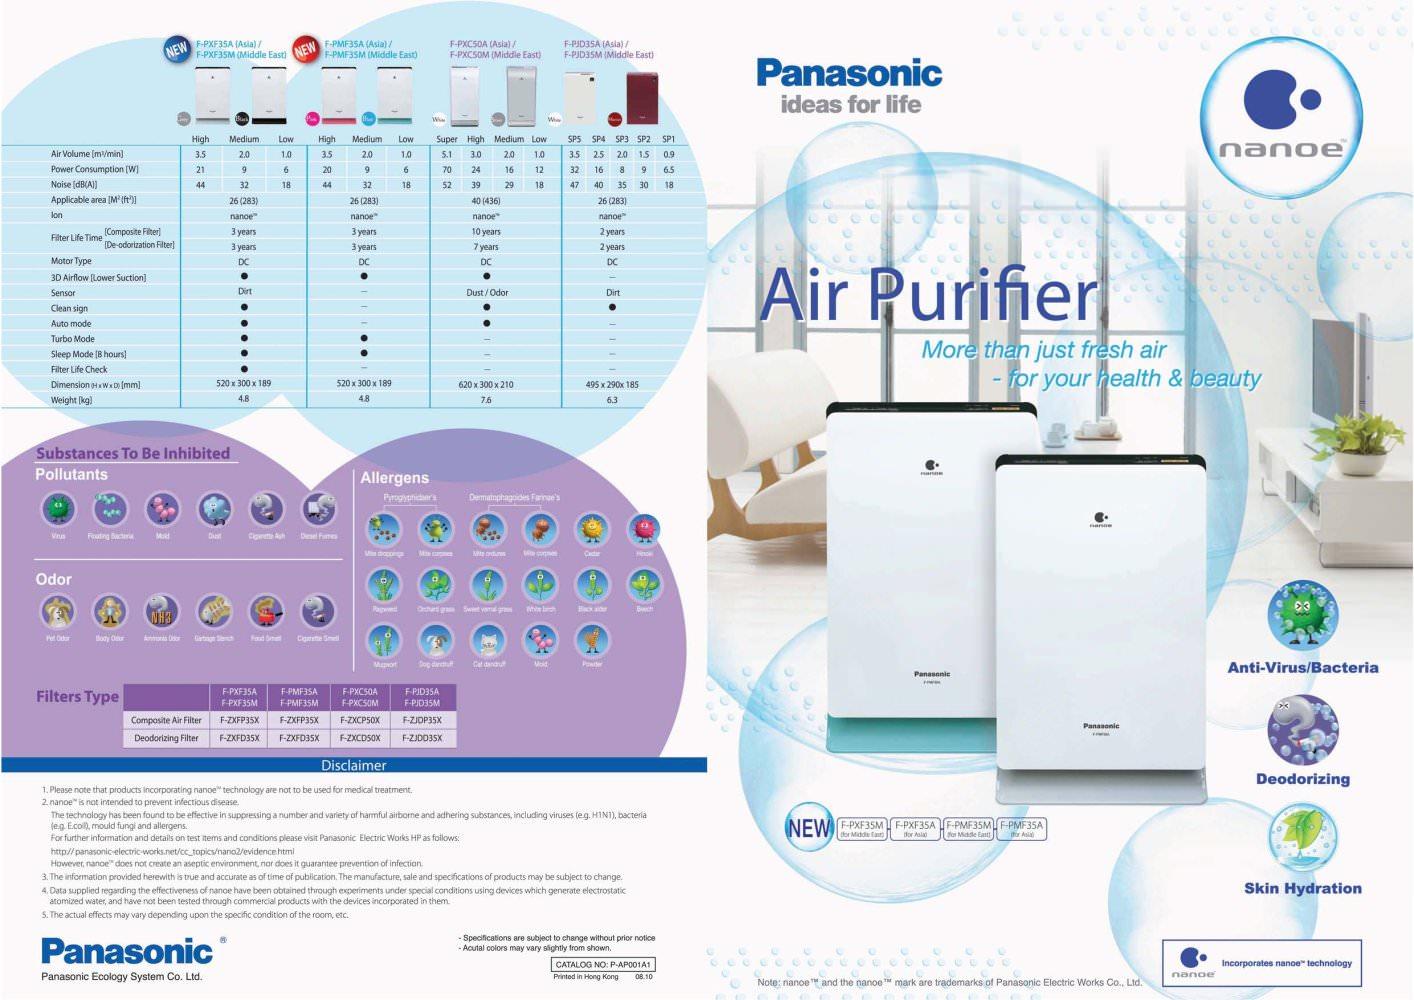 Air Curtain Merk Panasonic Design Lajada Gree 1 Pk Fm K Putih Curtains Home Appliances Pdf Catalogues